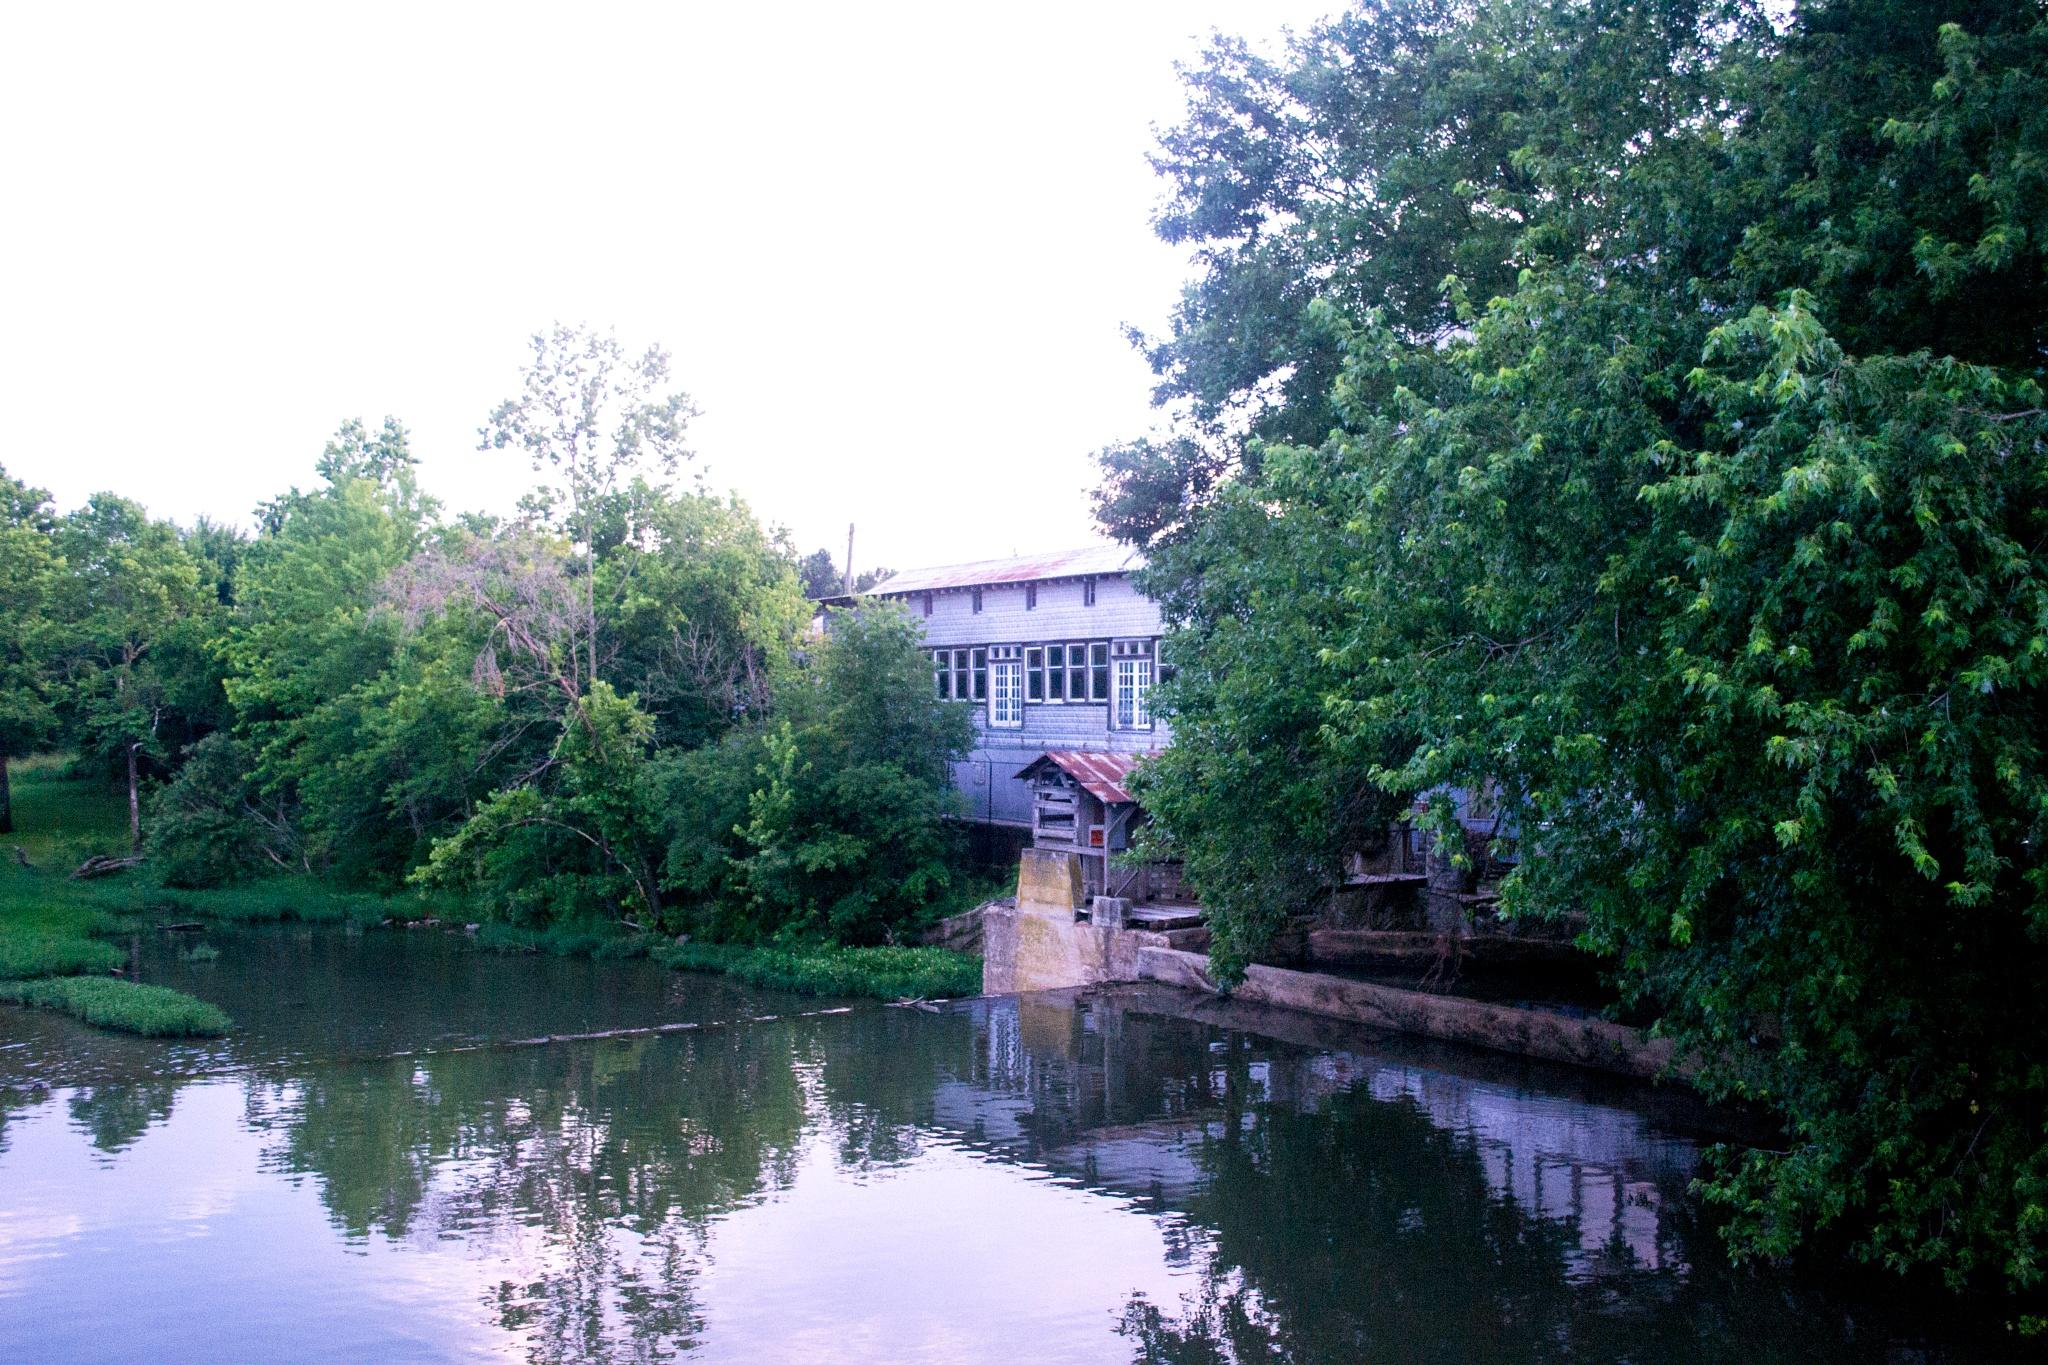 Ozark Mill III by Debbie Bridges